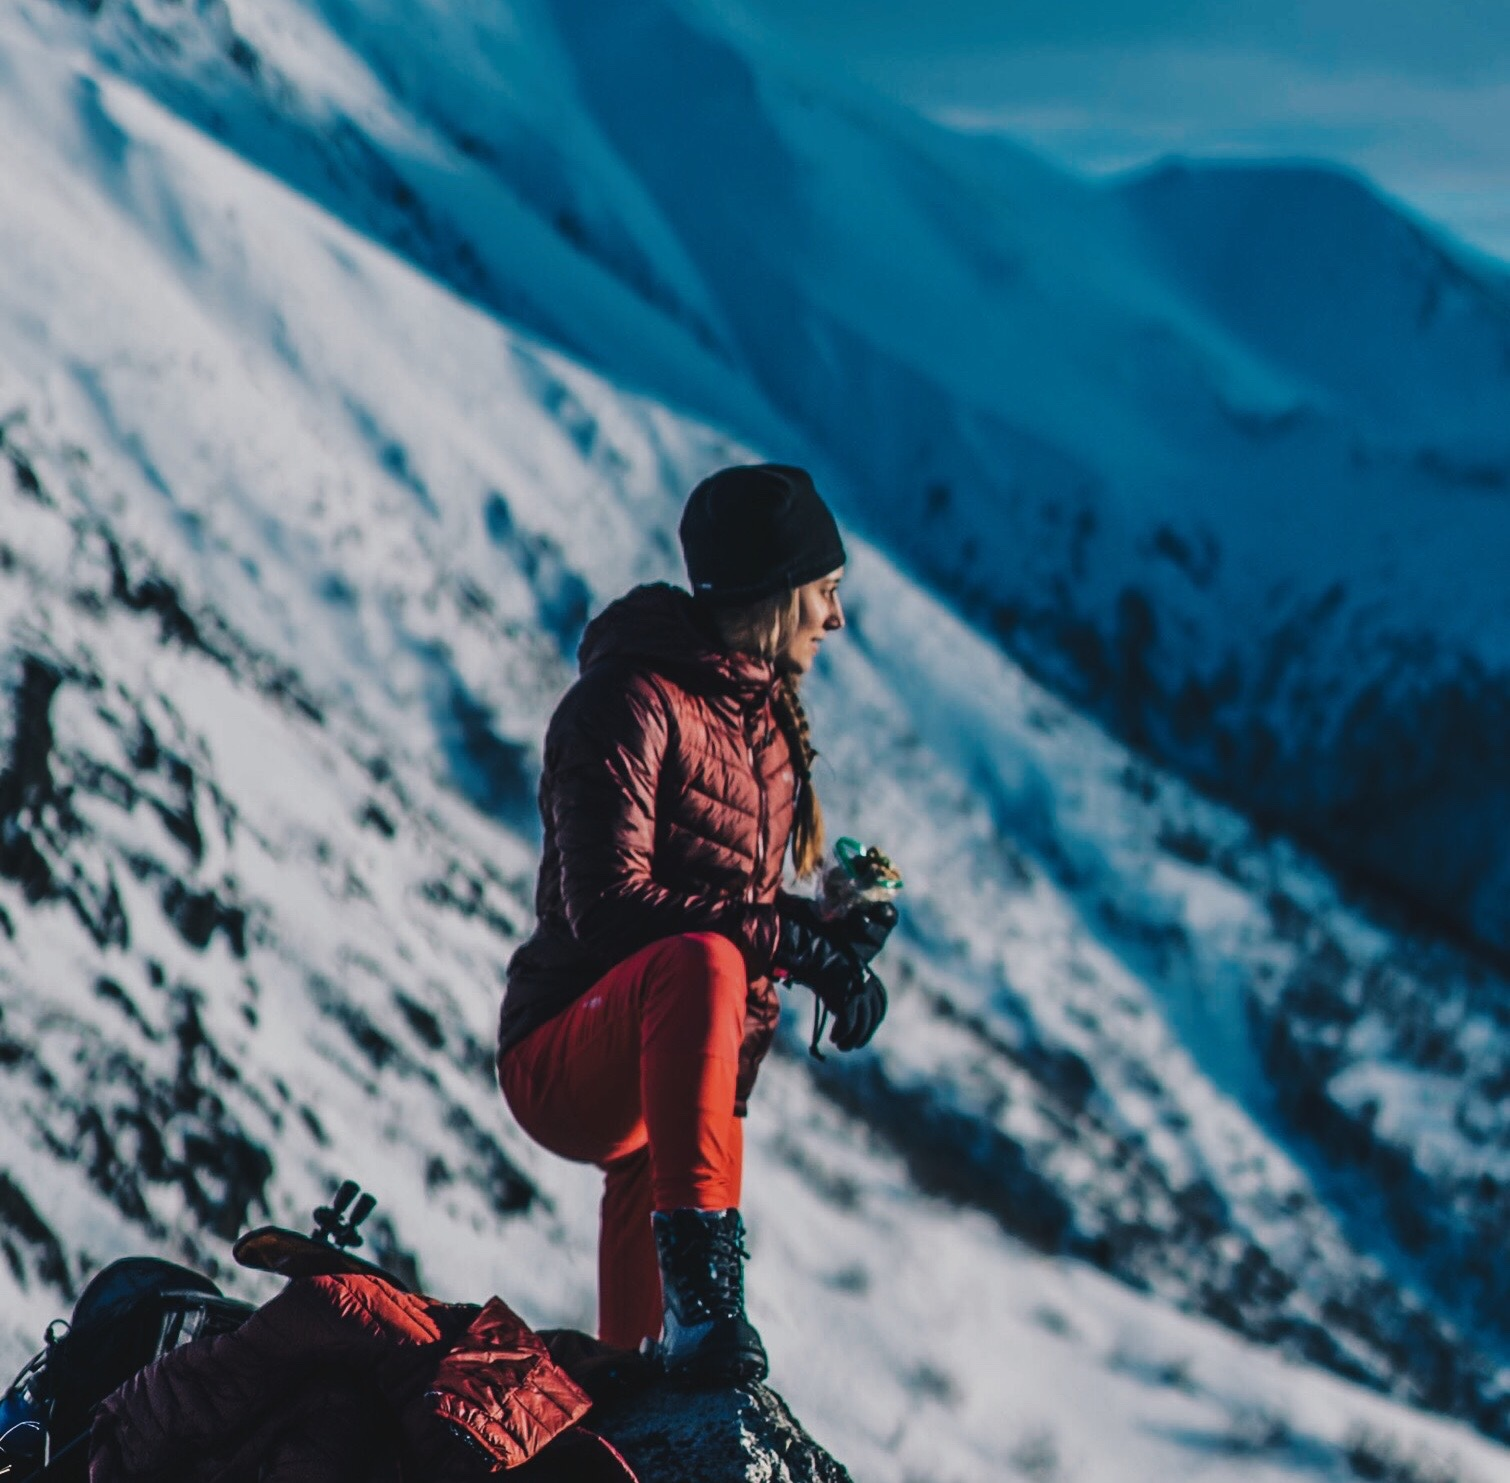 COLUMBIA SPORTSWEAR - X @MAR.CREATES, @TIMKEMPLE, CHUGACH MOUNTAINS, ALASKA